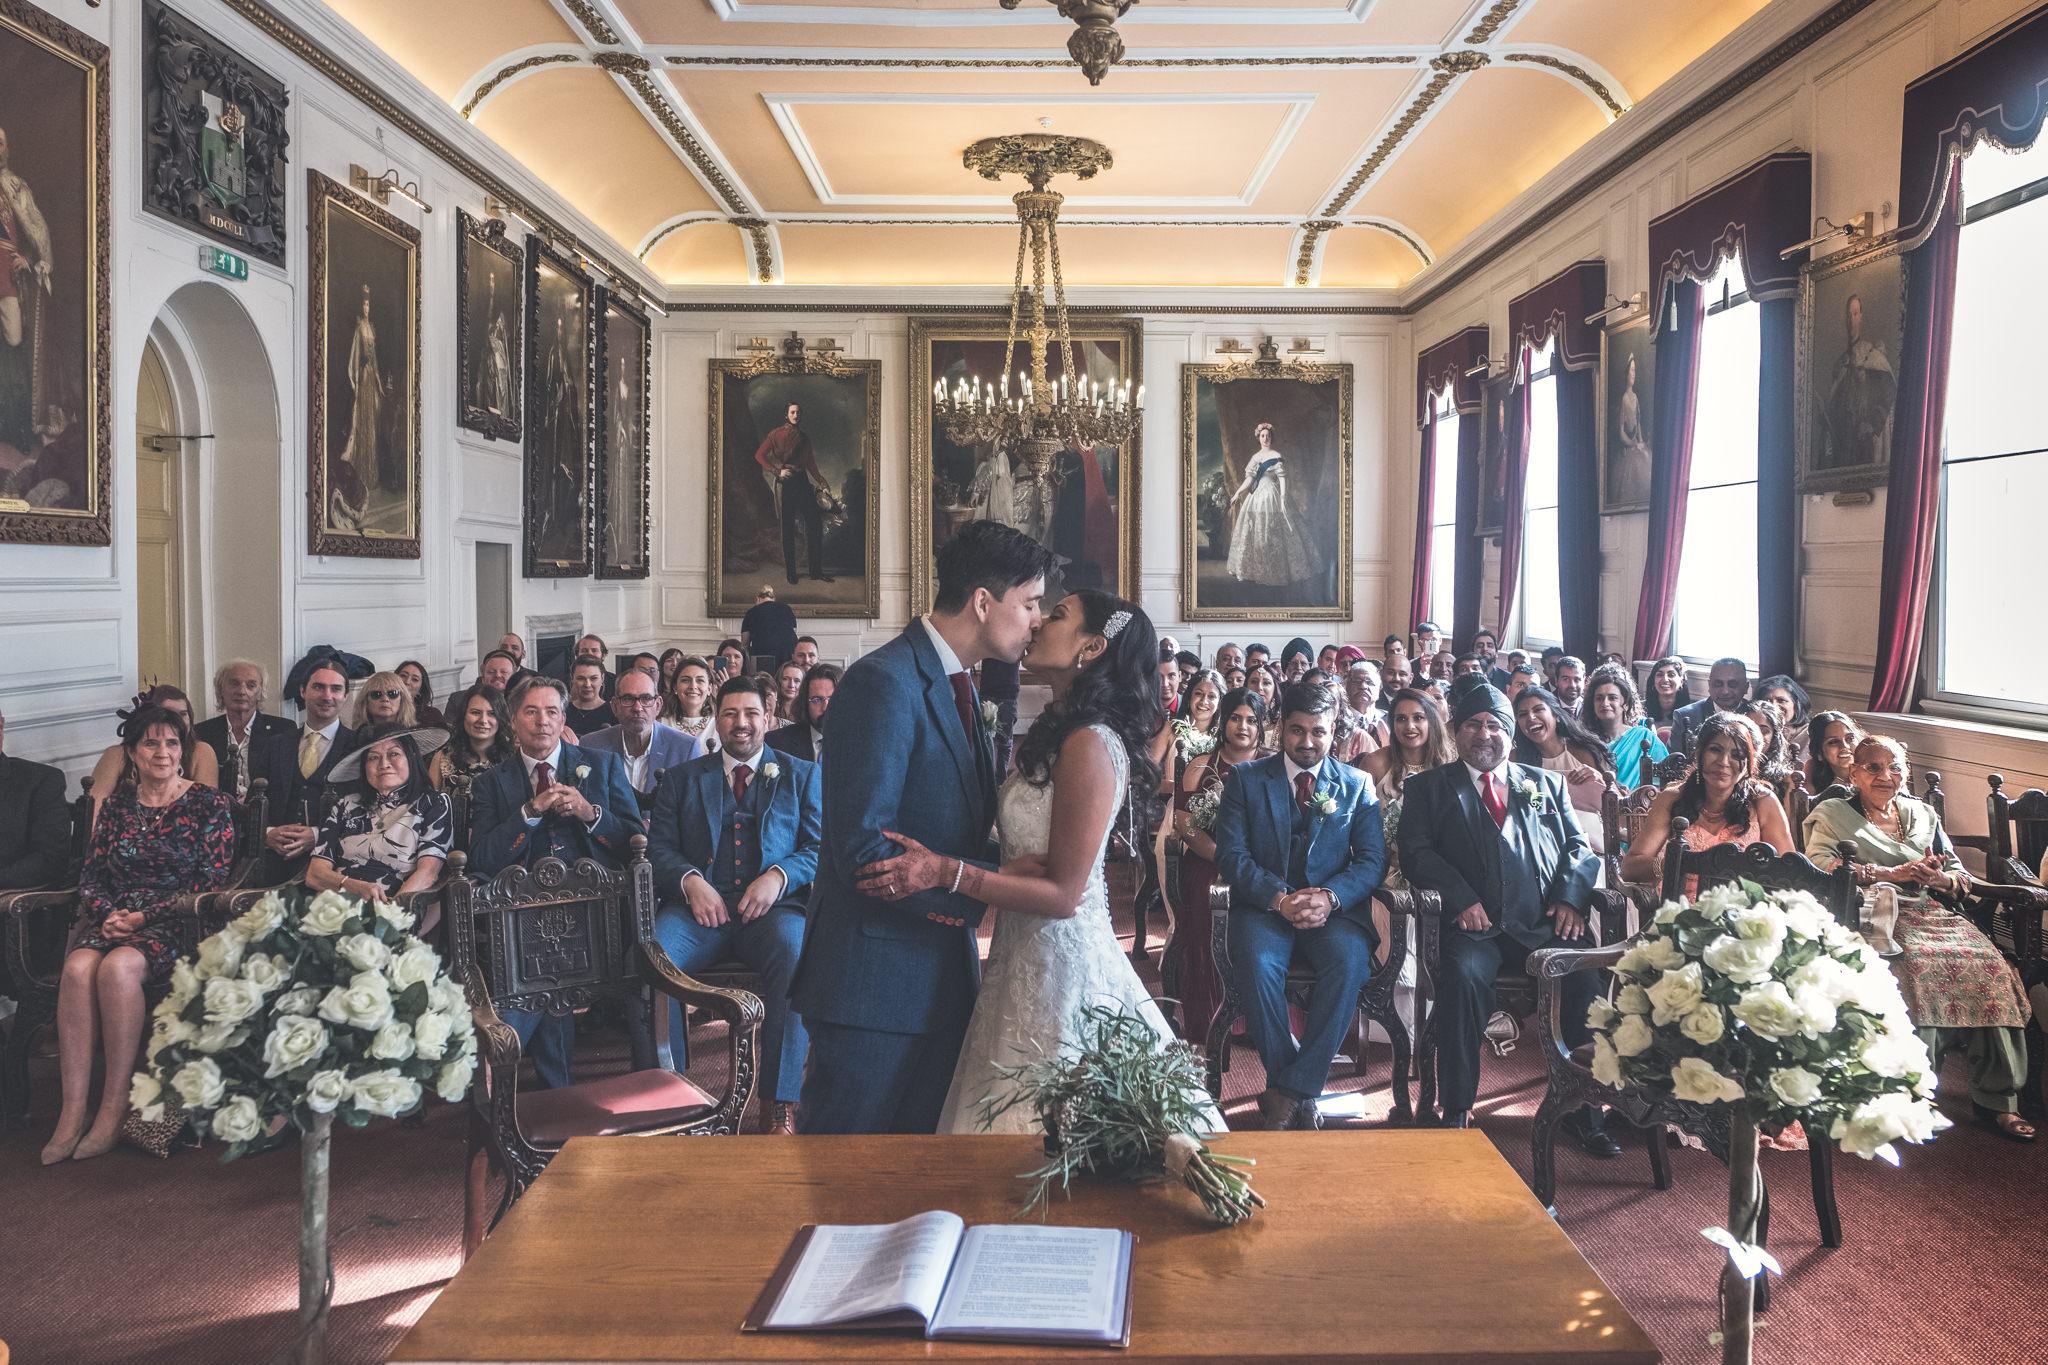 Windsor Guildhall Wedding Photography - Suki and Ricky